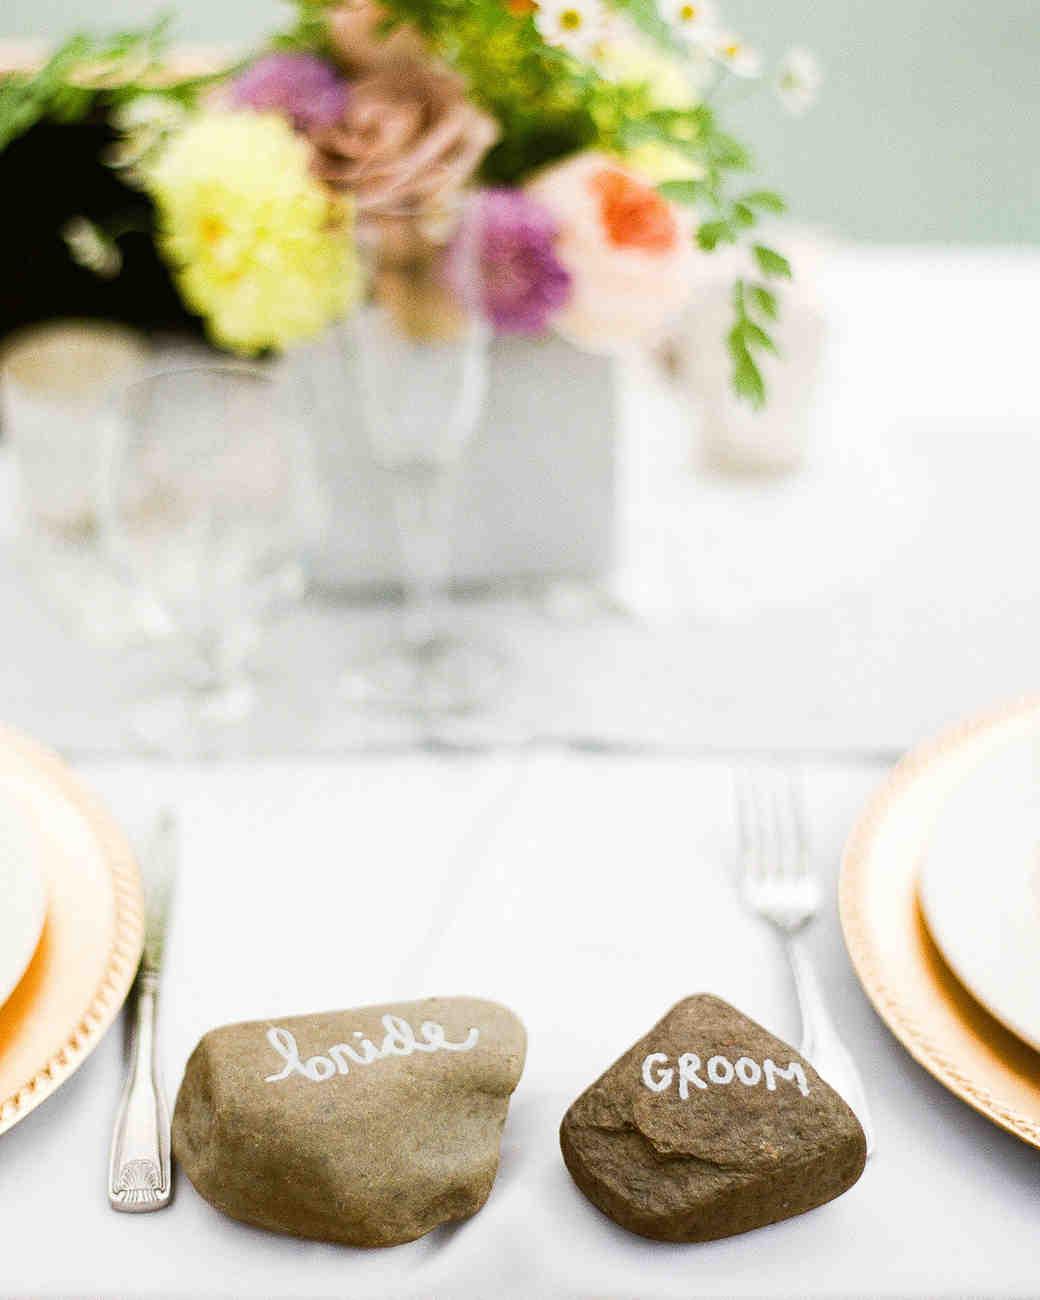 sandy-dwight-wedding-placecards-0514.jpg